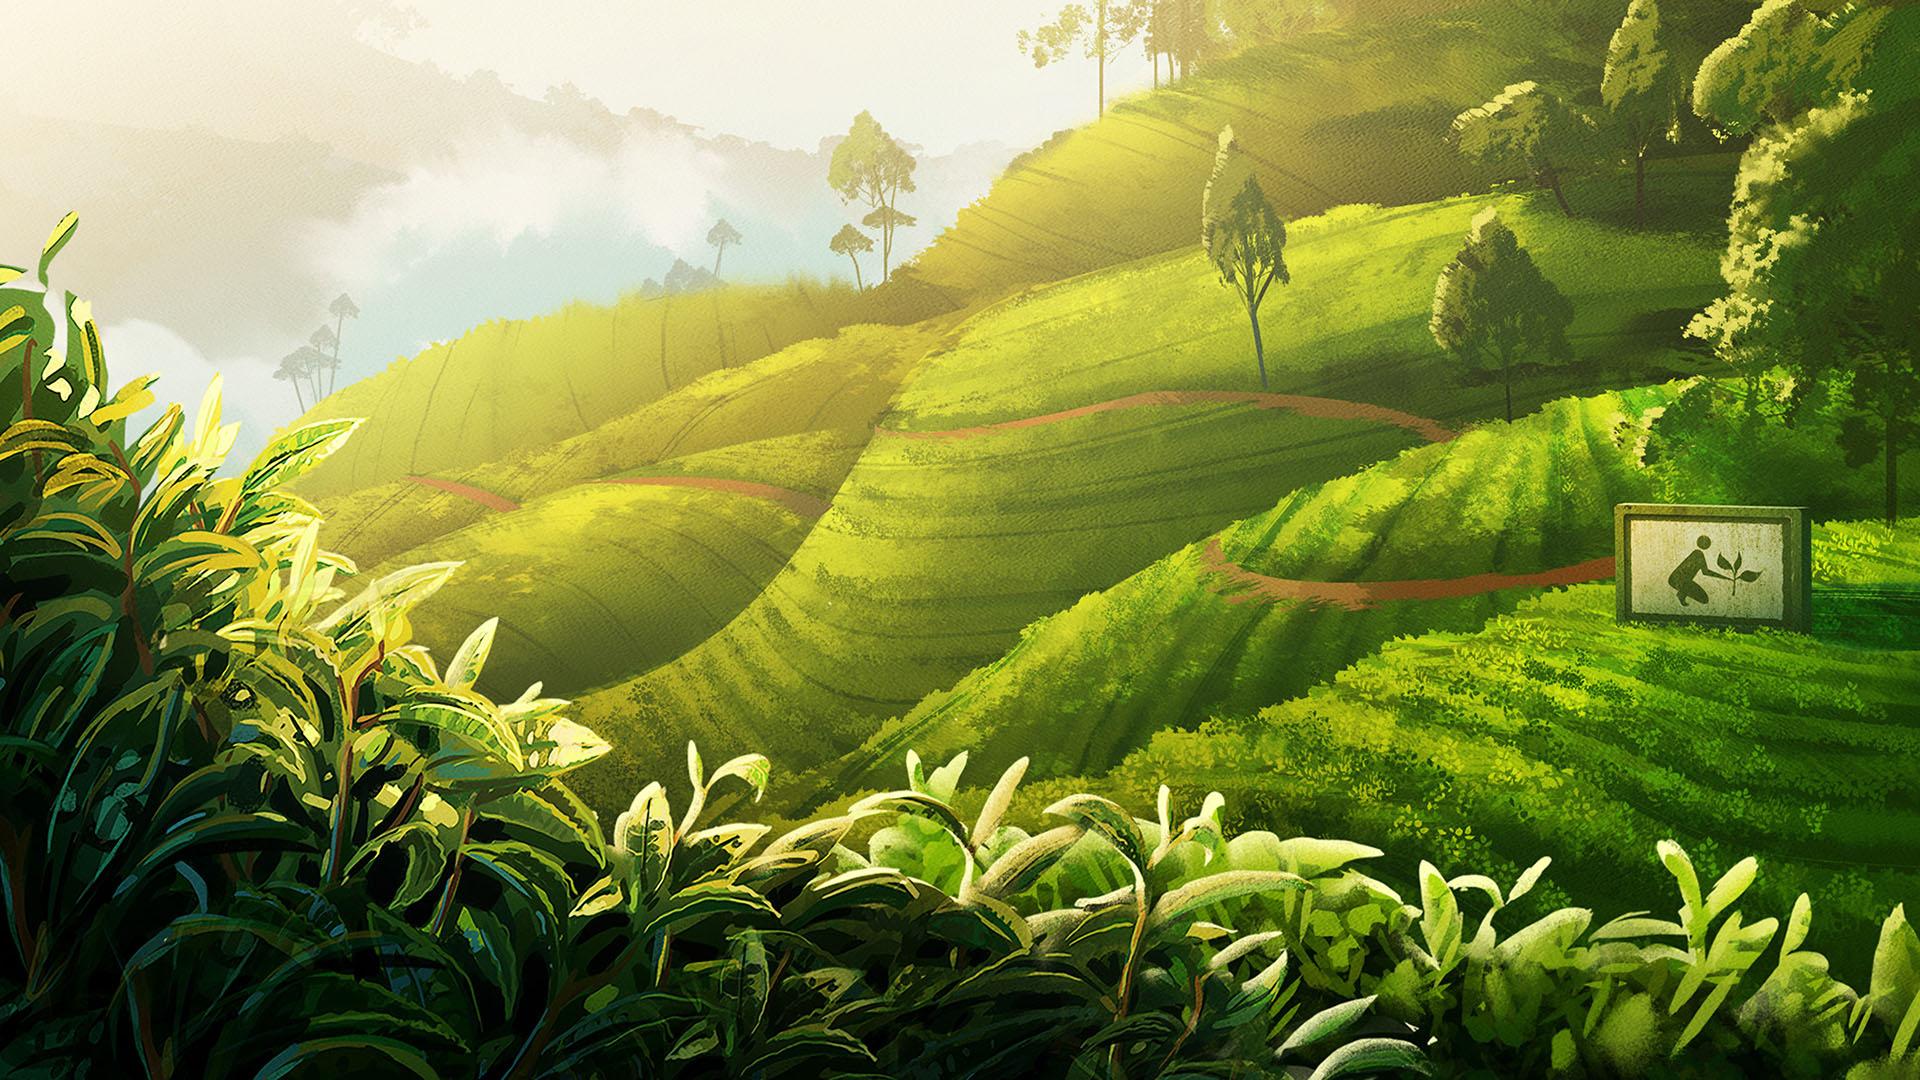 Gogo Tea: Backgrounds